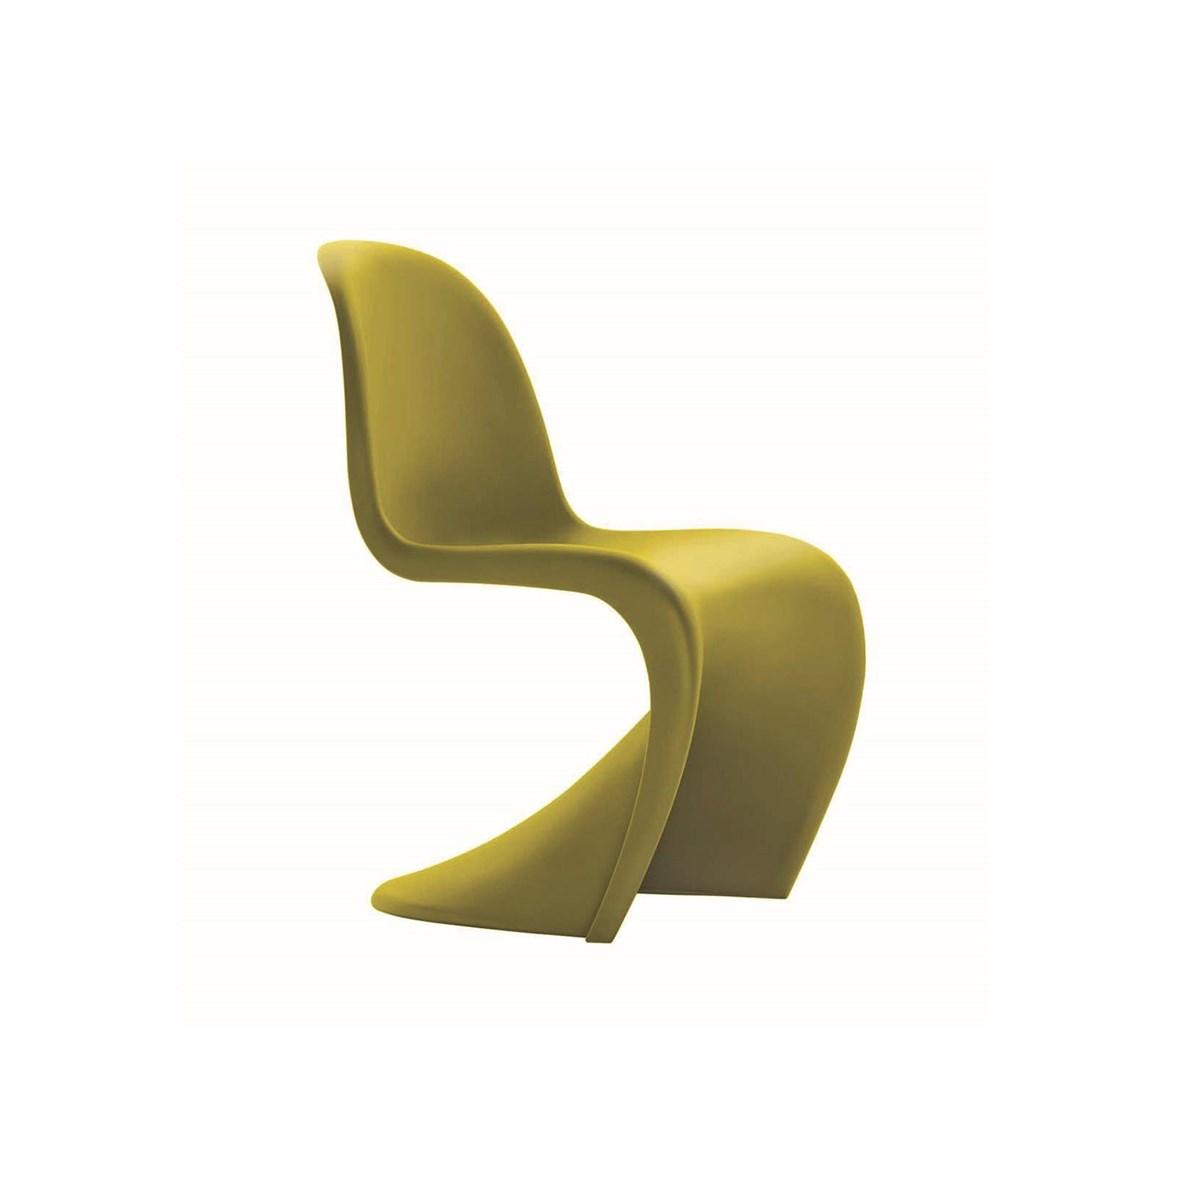 Vitra-Verner-Panton-Panton-Chair-Matisse-1